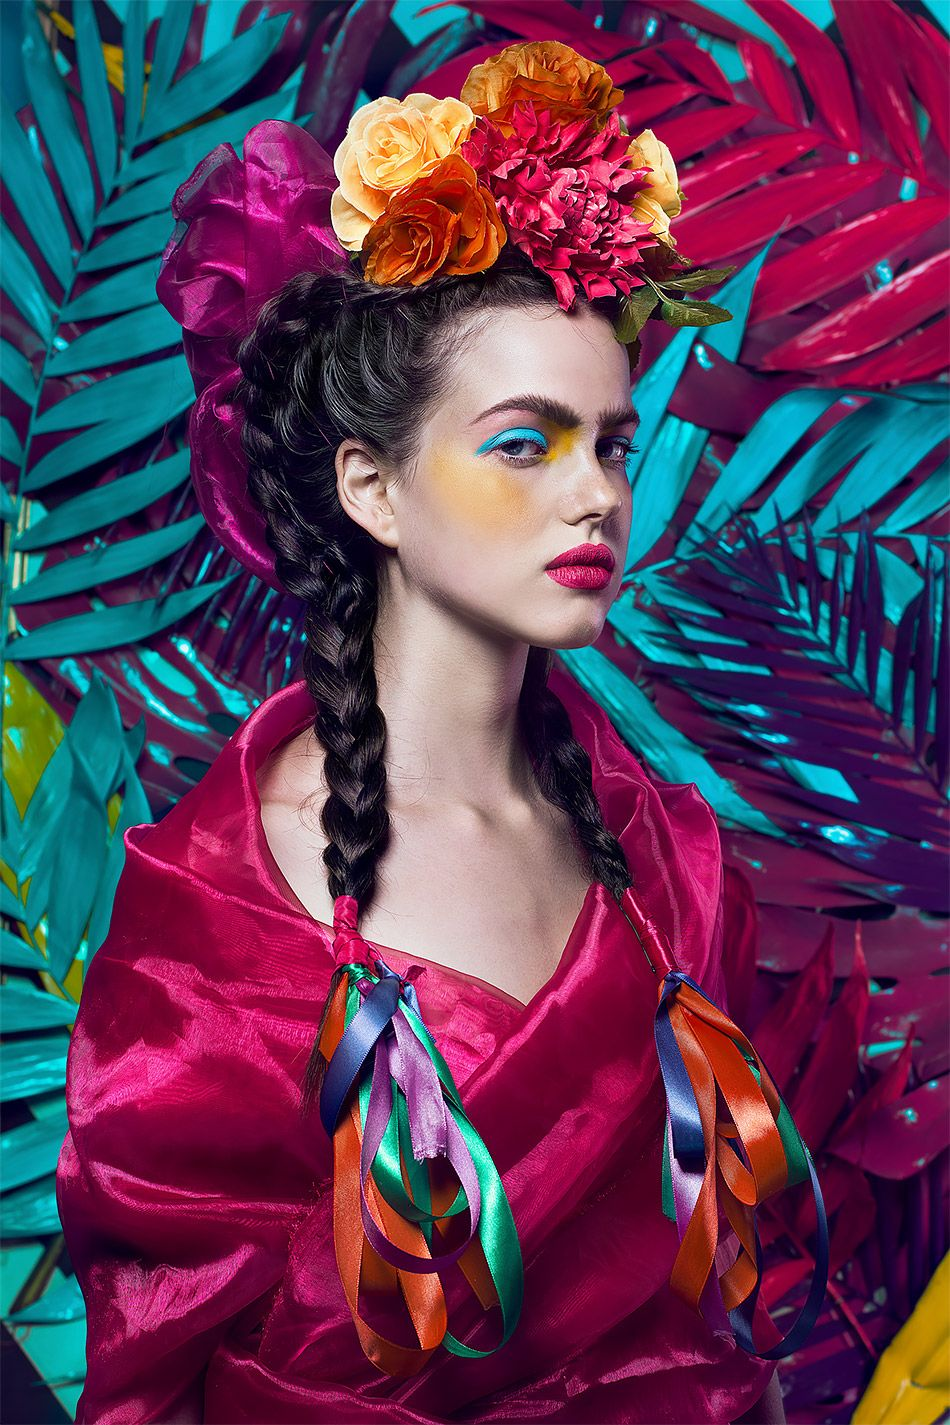 Creative Fashion Photography by Fernando Rodriguez | Daily ...